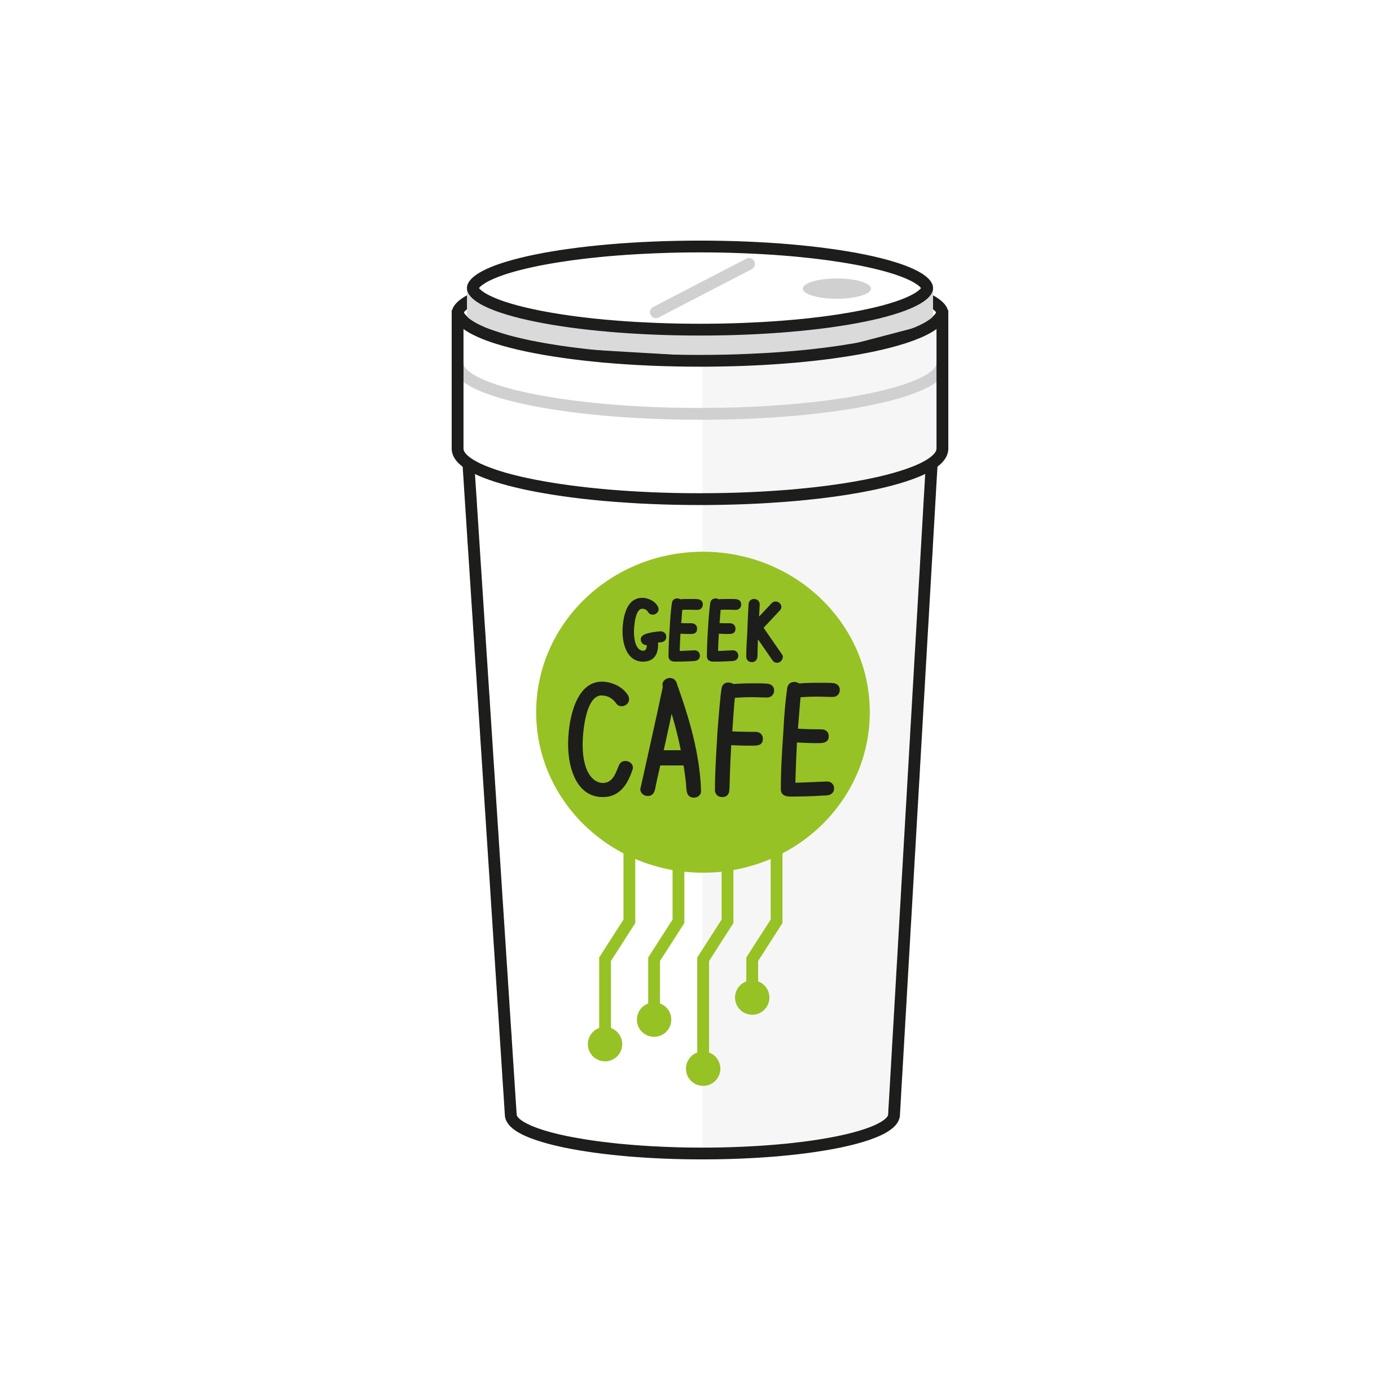 Geek Cafe